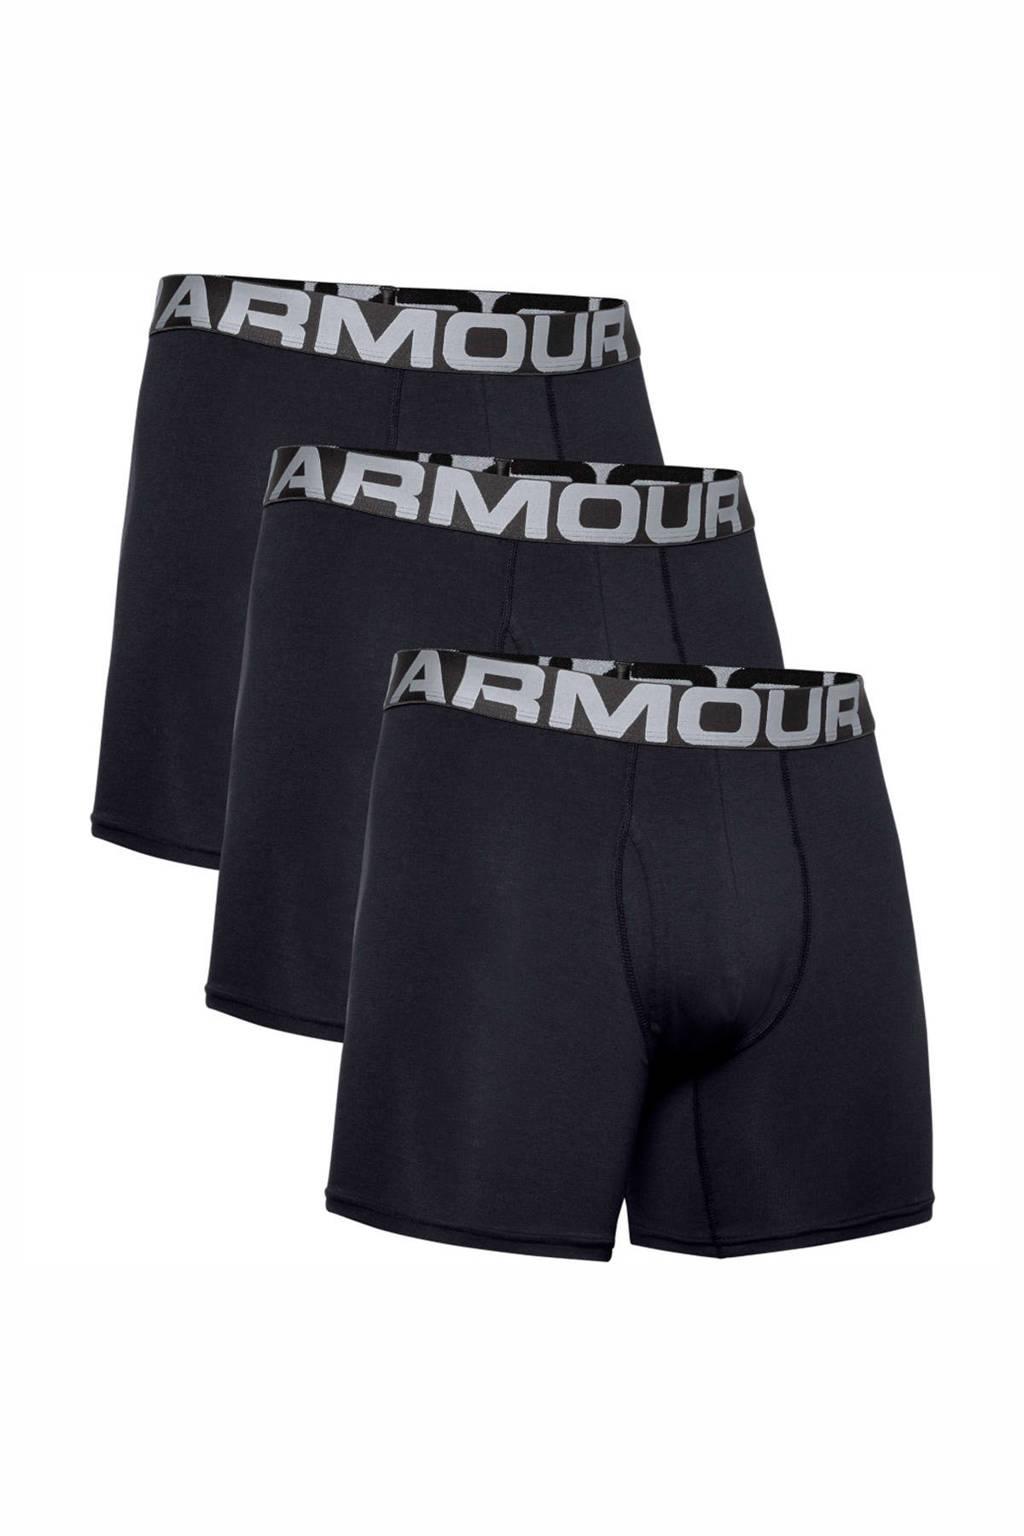 Under Armour sportboxer - set van 3, Zwart